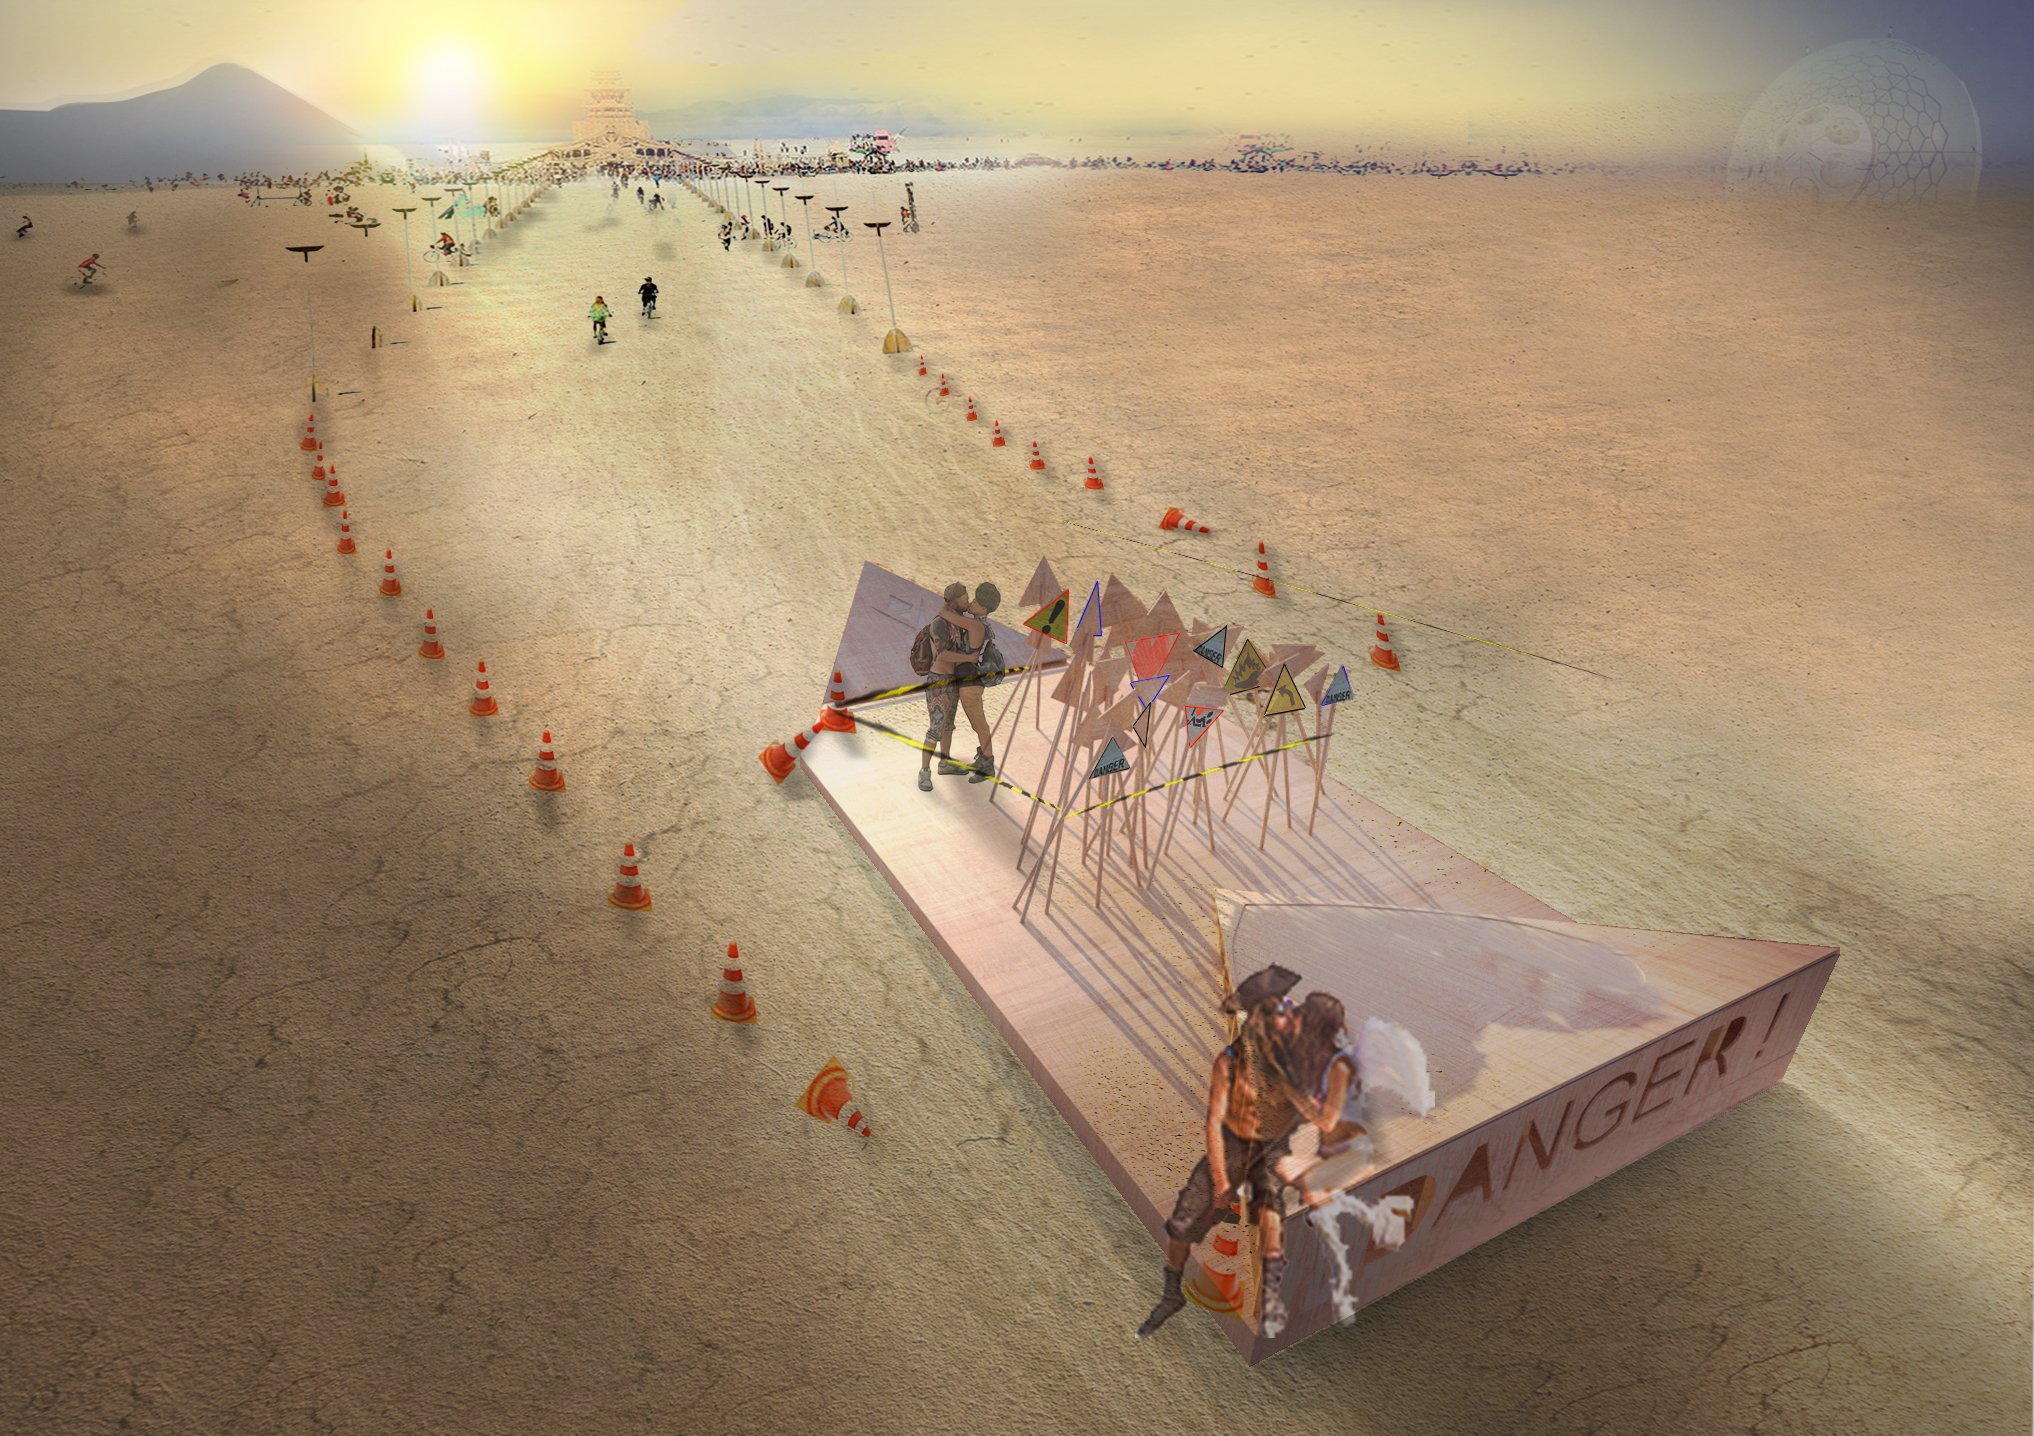 Burning Man Festival (1)